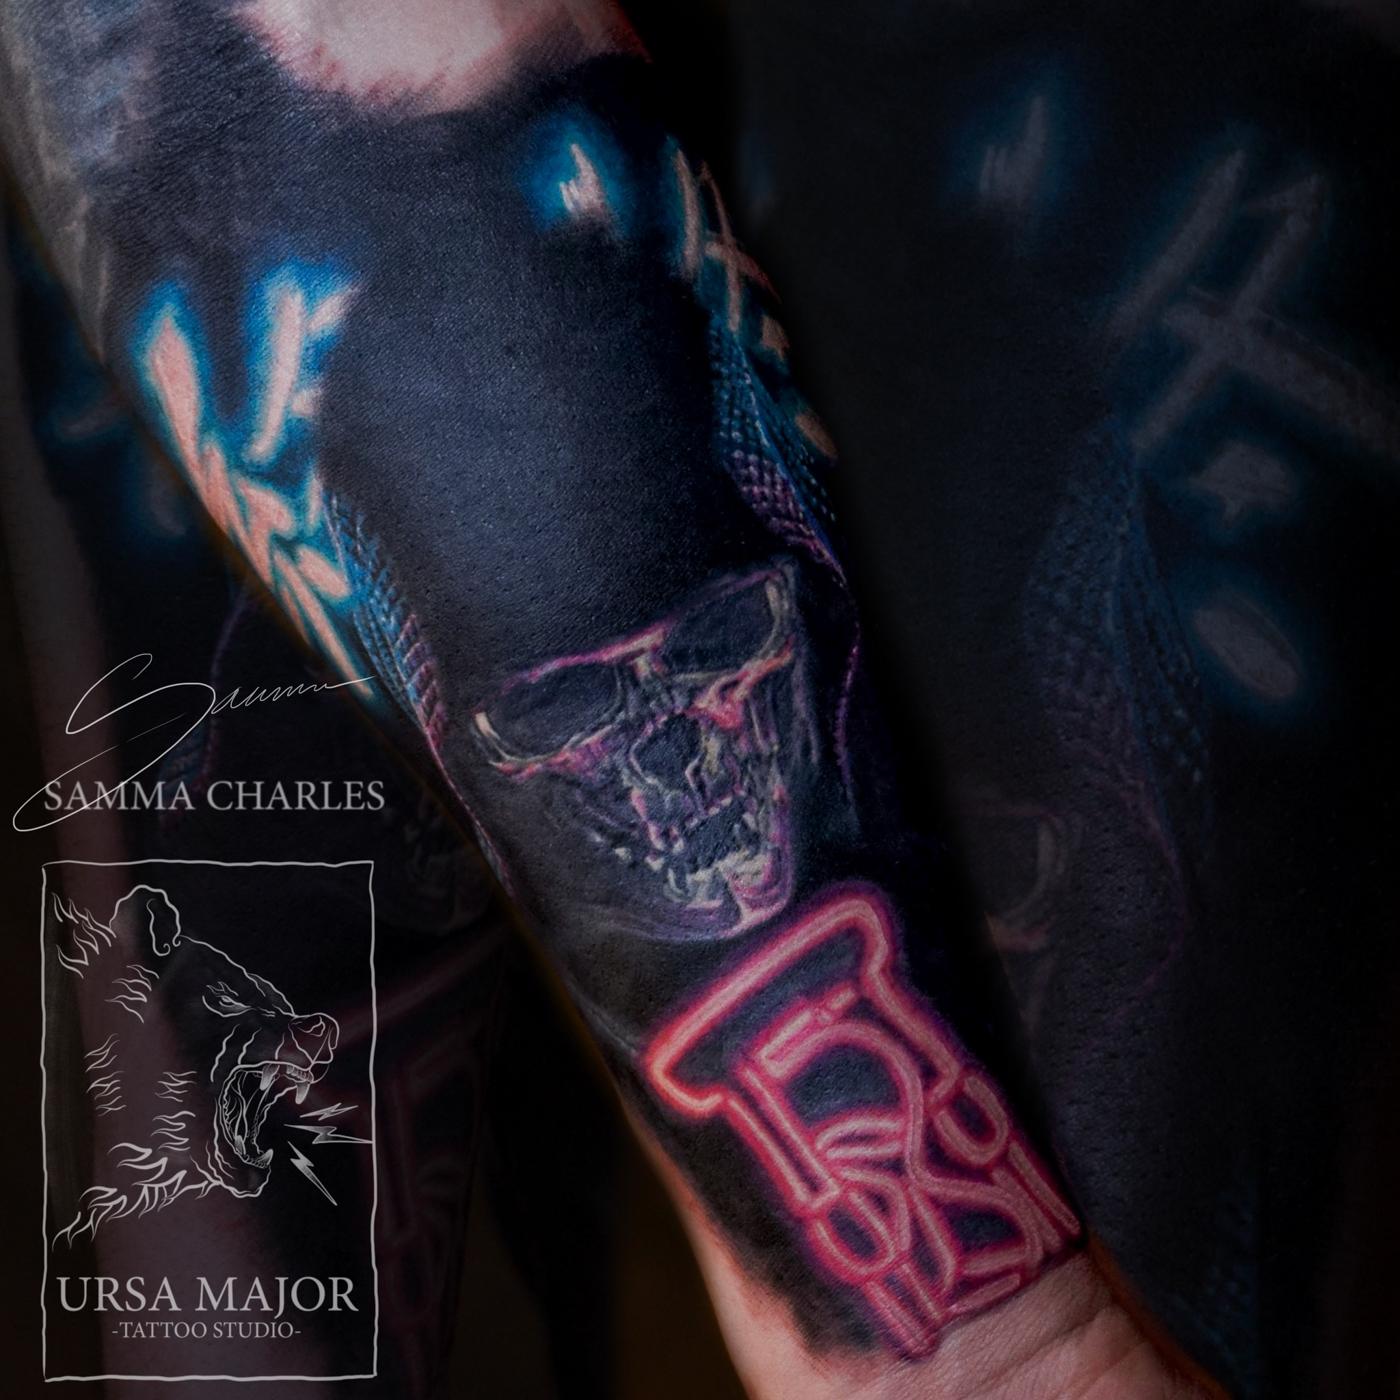 oxfordshire-tattoo-studio-38.jpg